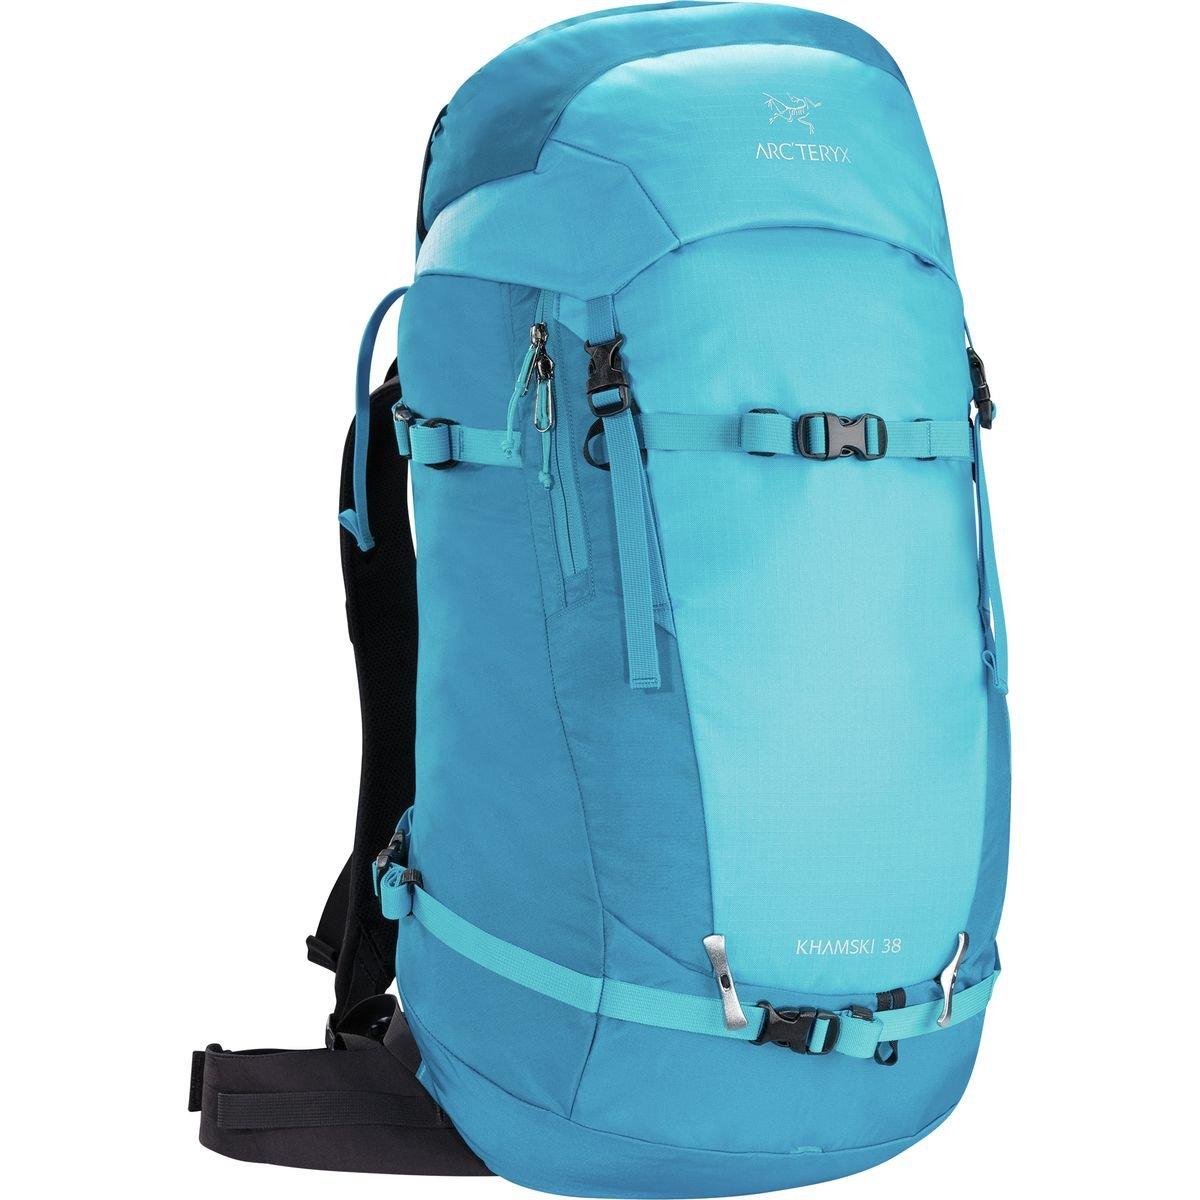 ARC`TERYX(アークテリクス) カムスキー 38 Khamski 38 Backpack 15-16FW L06507200 Ionian Blue REG   B013C9KWTO